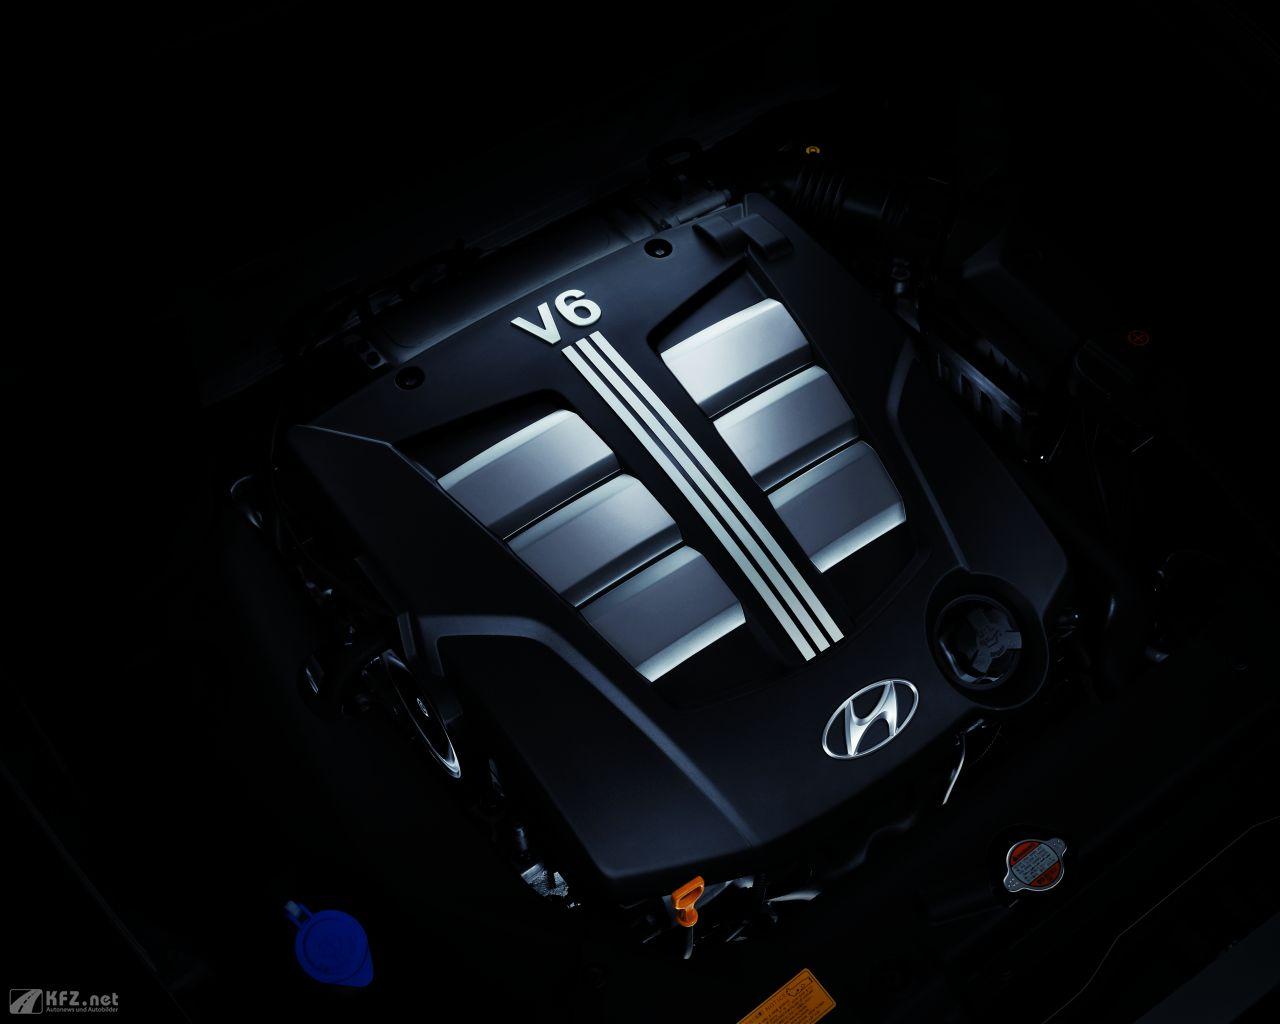 hyundai-coupe-1280x1024-201